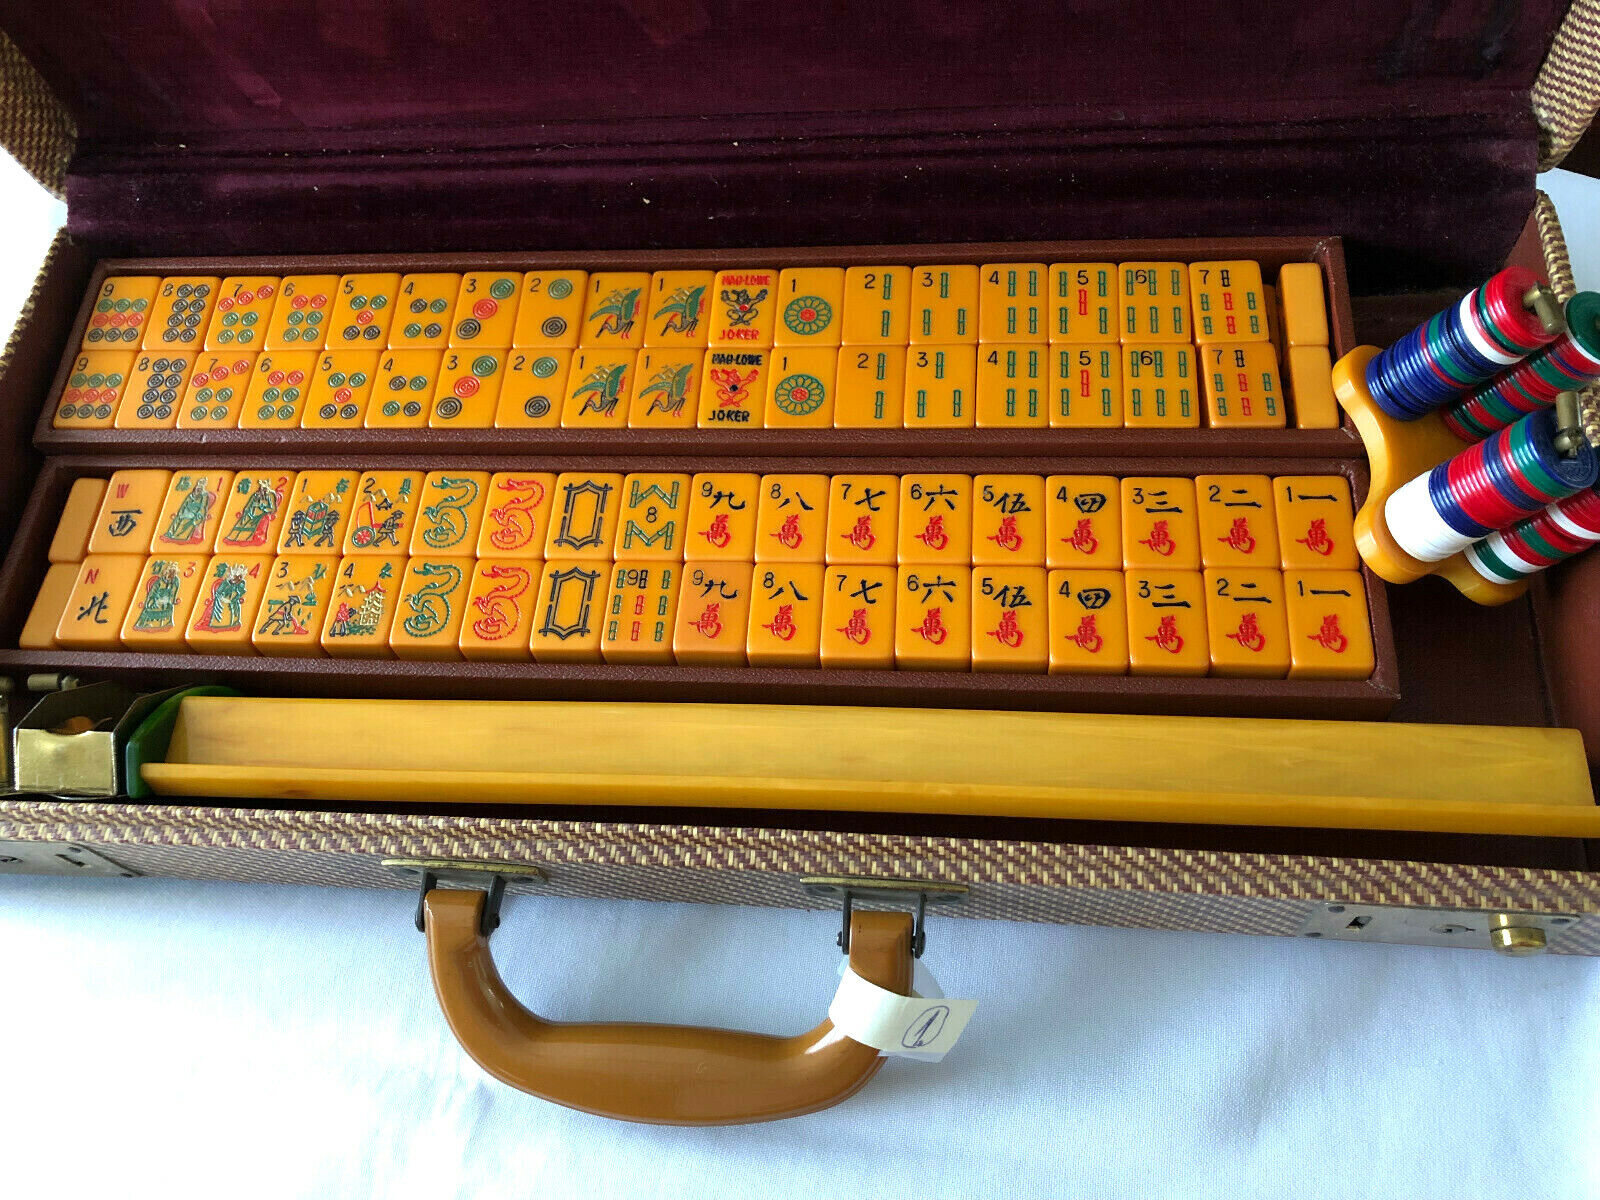 Vintage Mah  Jong Set with 152 tiles plus bank, Mahjong, Old Bakelite  prodotto di qualità